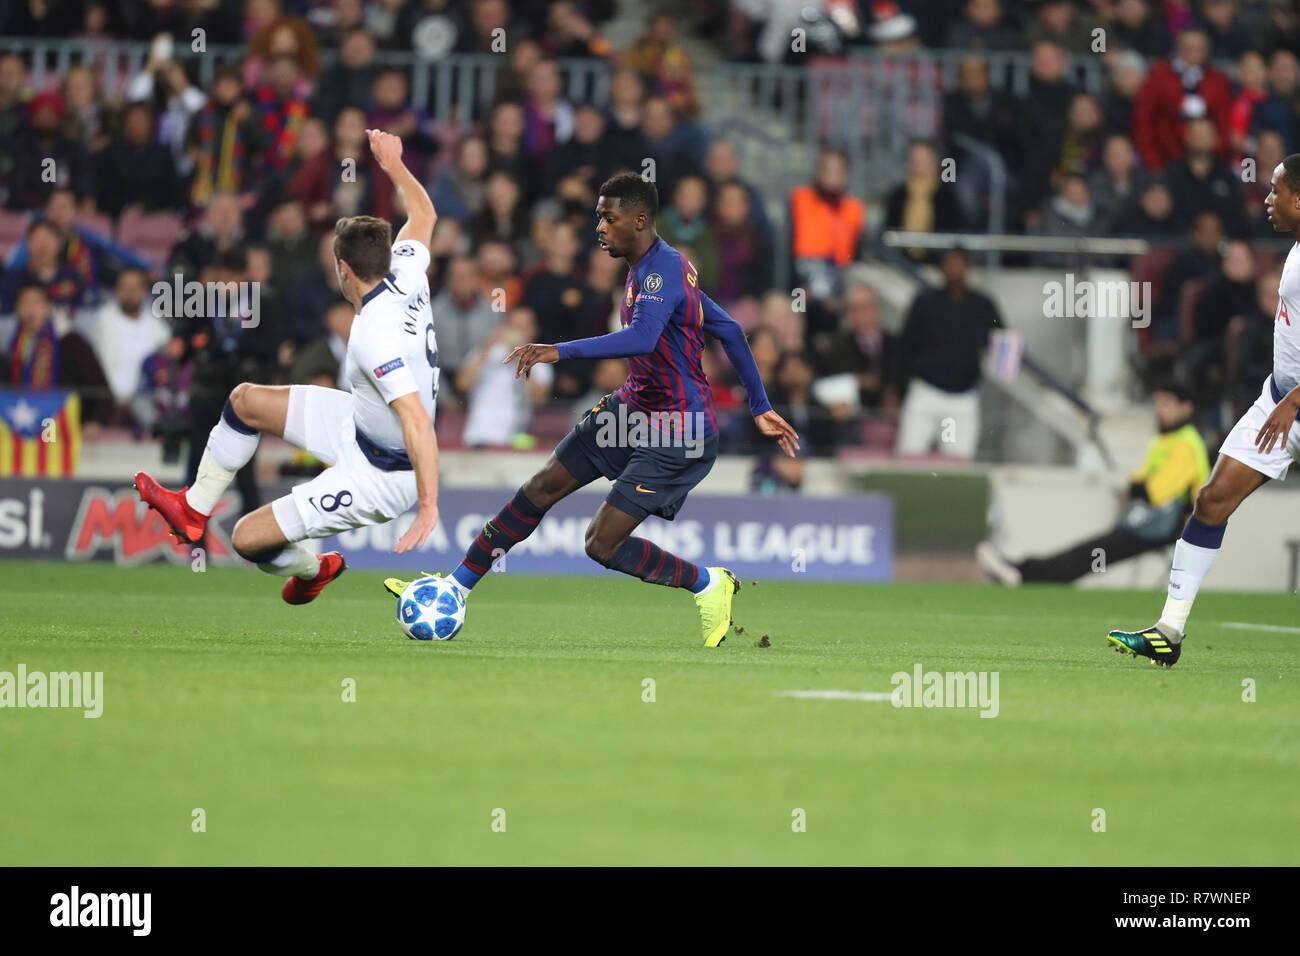 Barcelona Spain 11th Dec 2018 December 10 2018 Barcelona